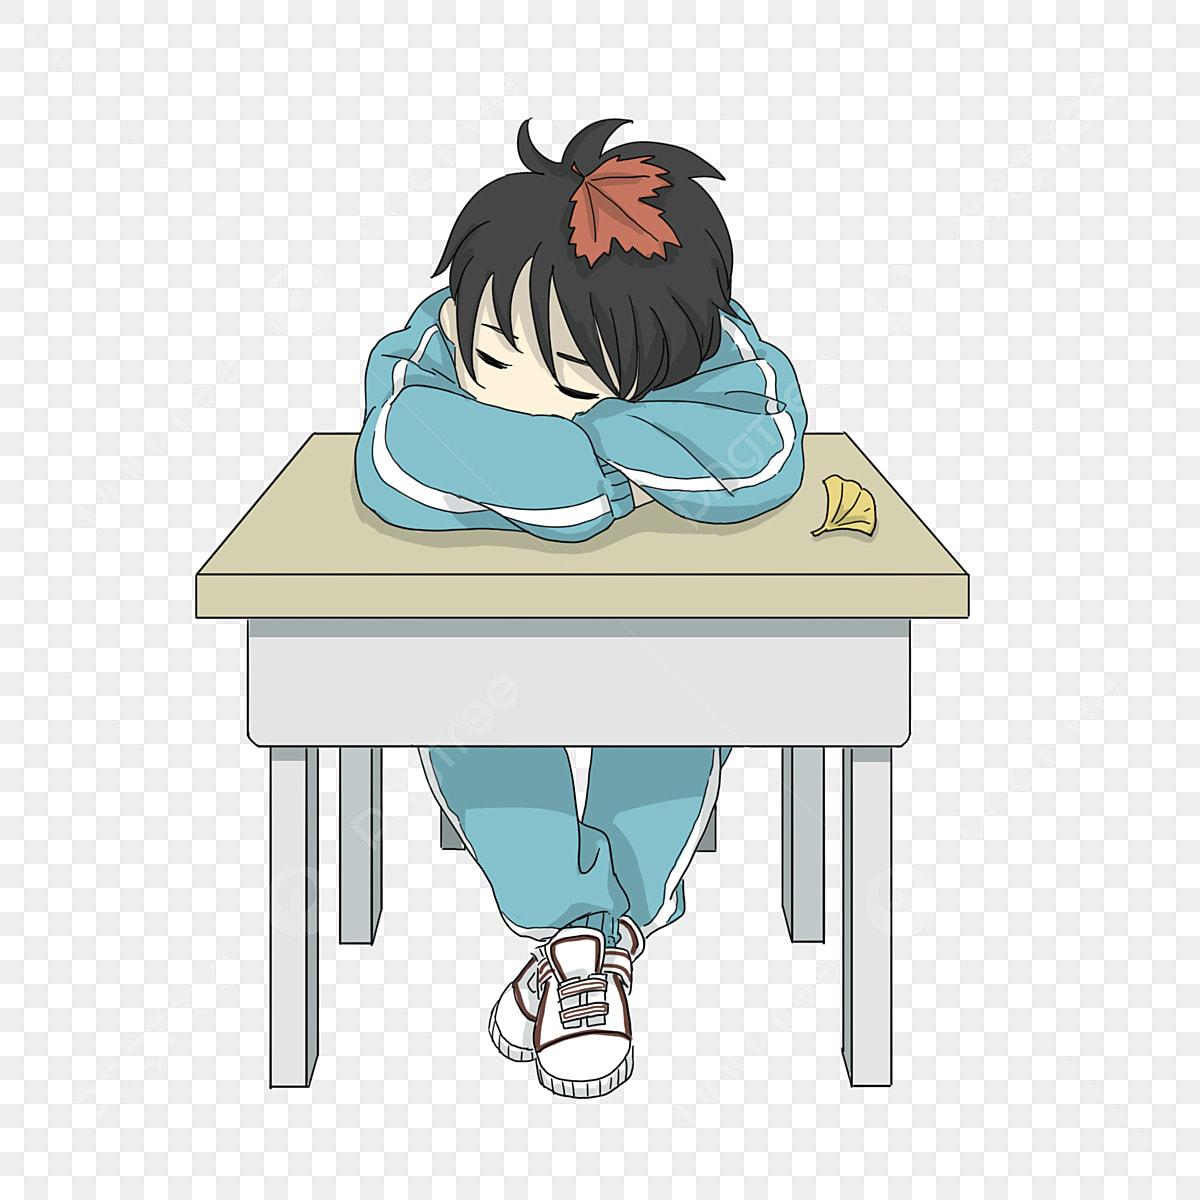 Garçon Dormant Sur La Table Version Cartoon Q Garçon Garçon